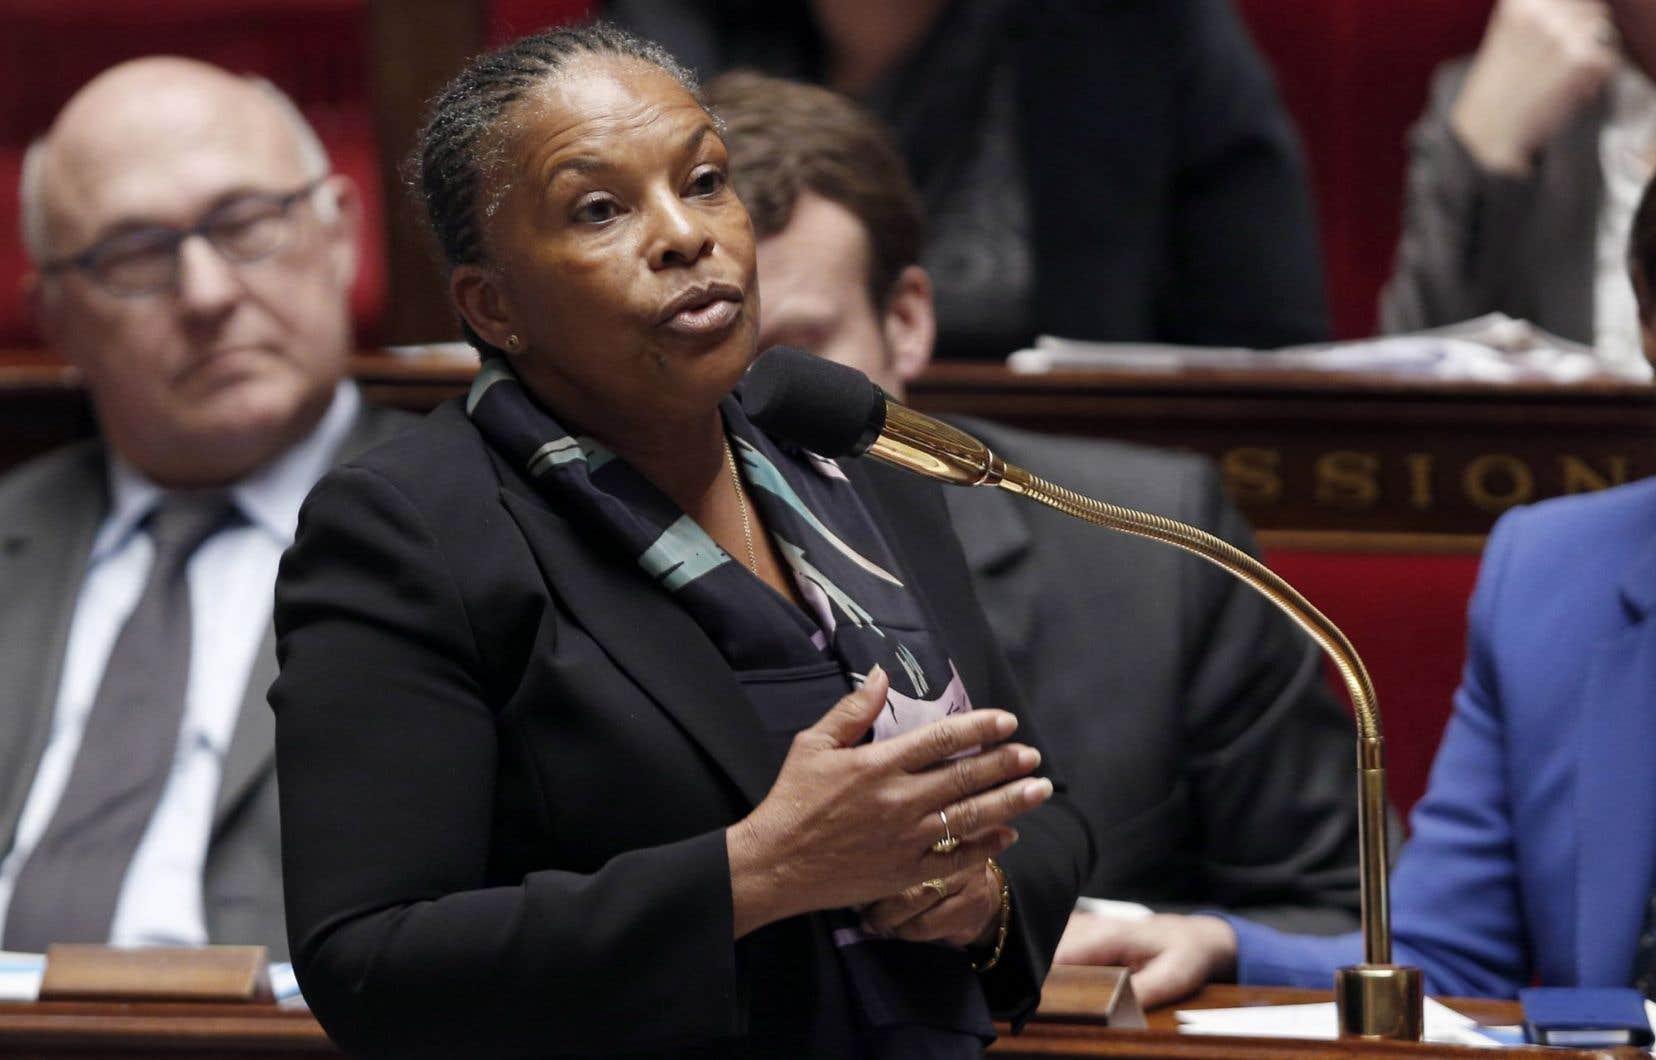 La ministre de la Justice française, Christiane Taubira